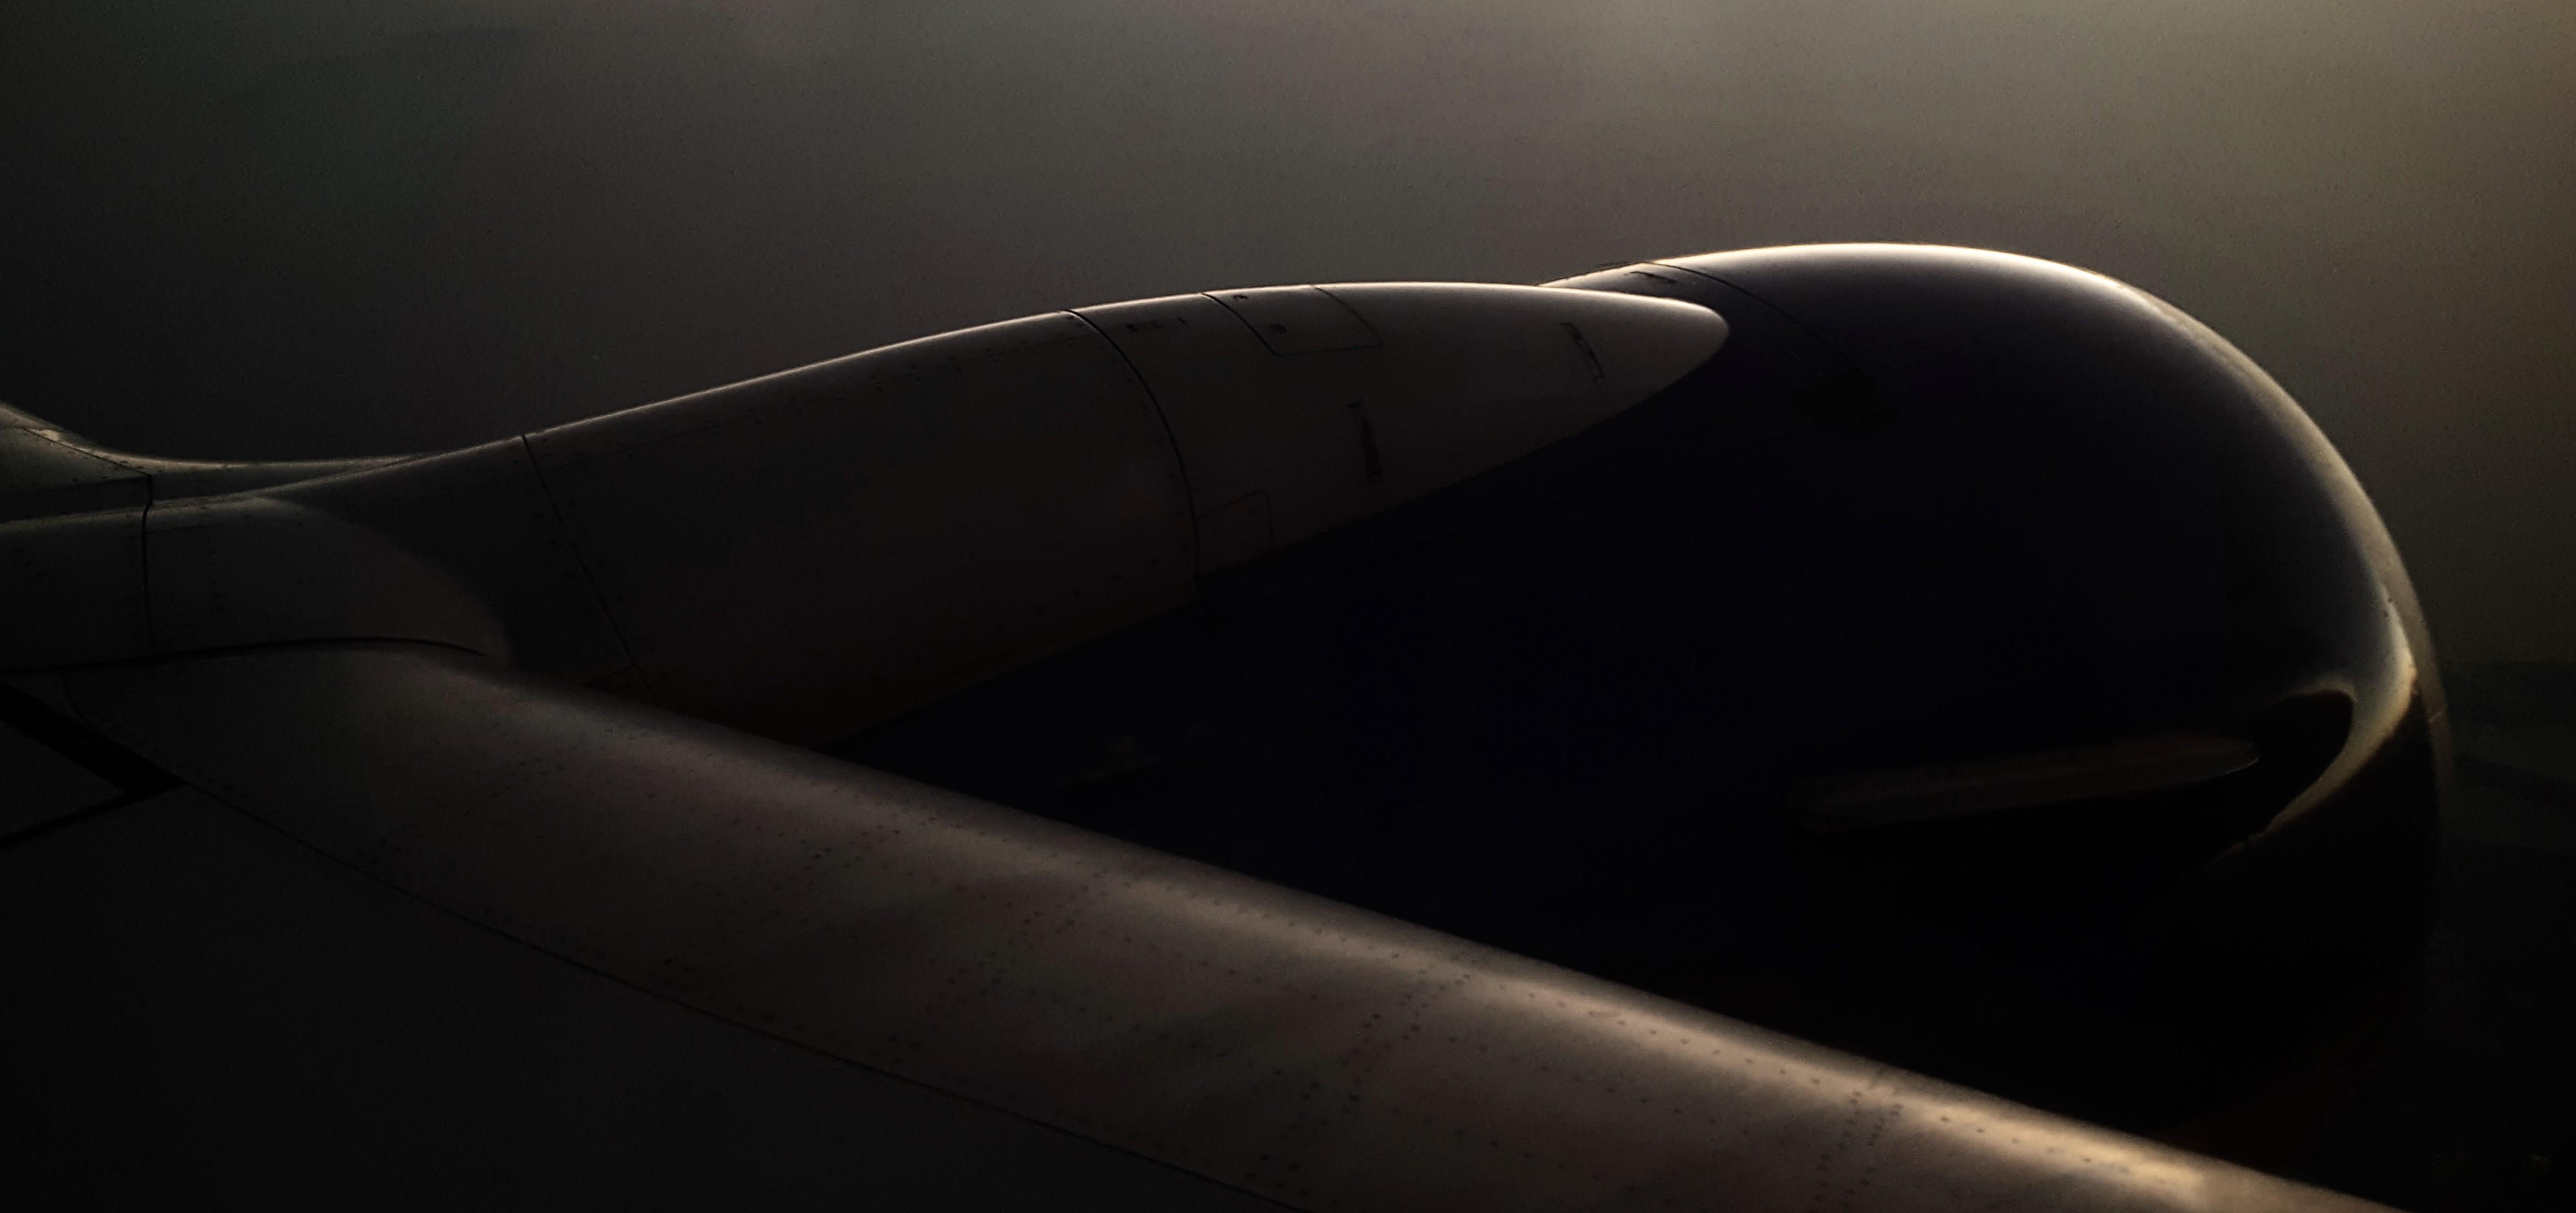 737 nacelle